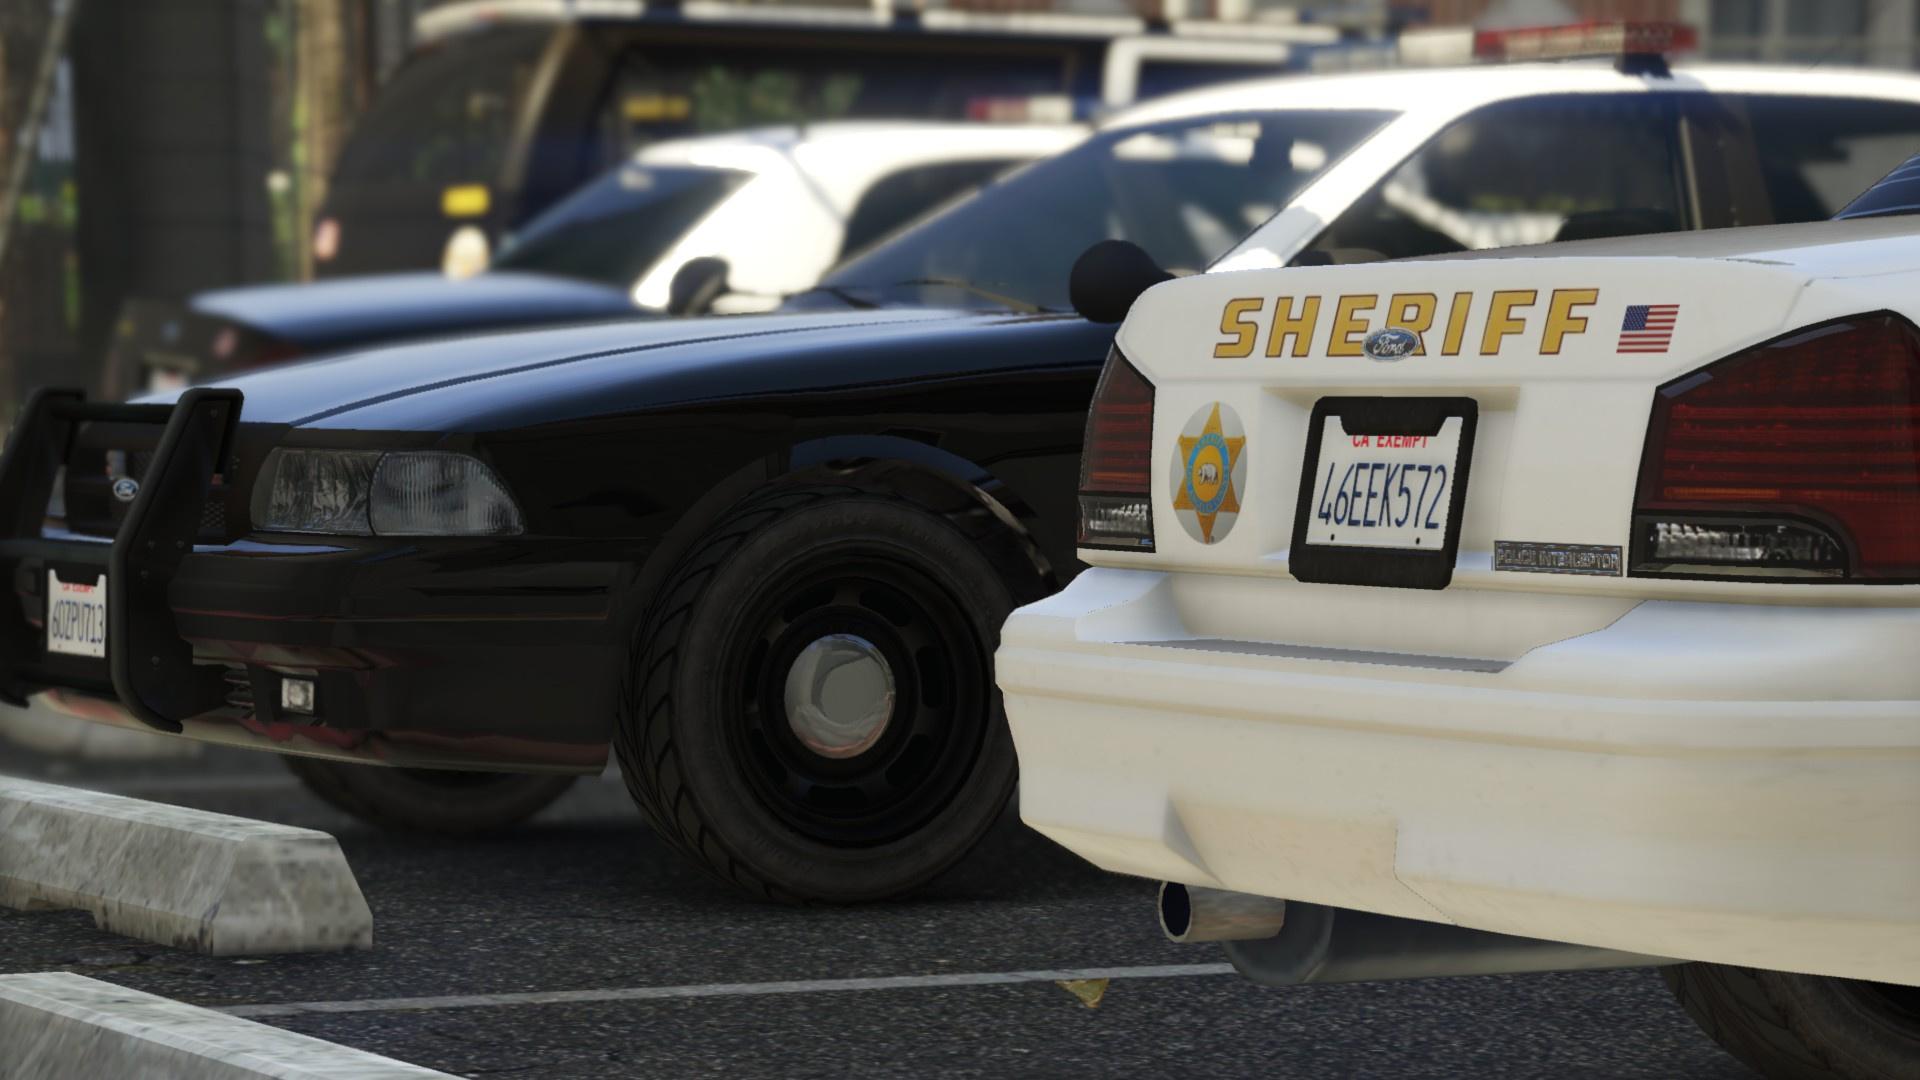 Los Angeles Police / Sheriff - Realism Mod - GTA5-Mods com